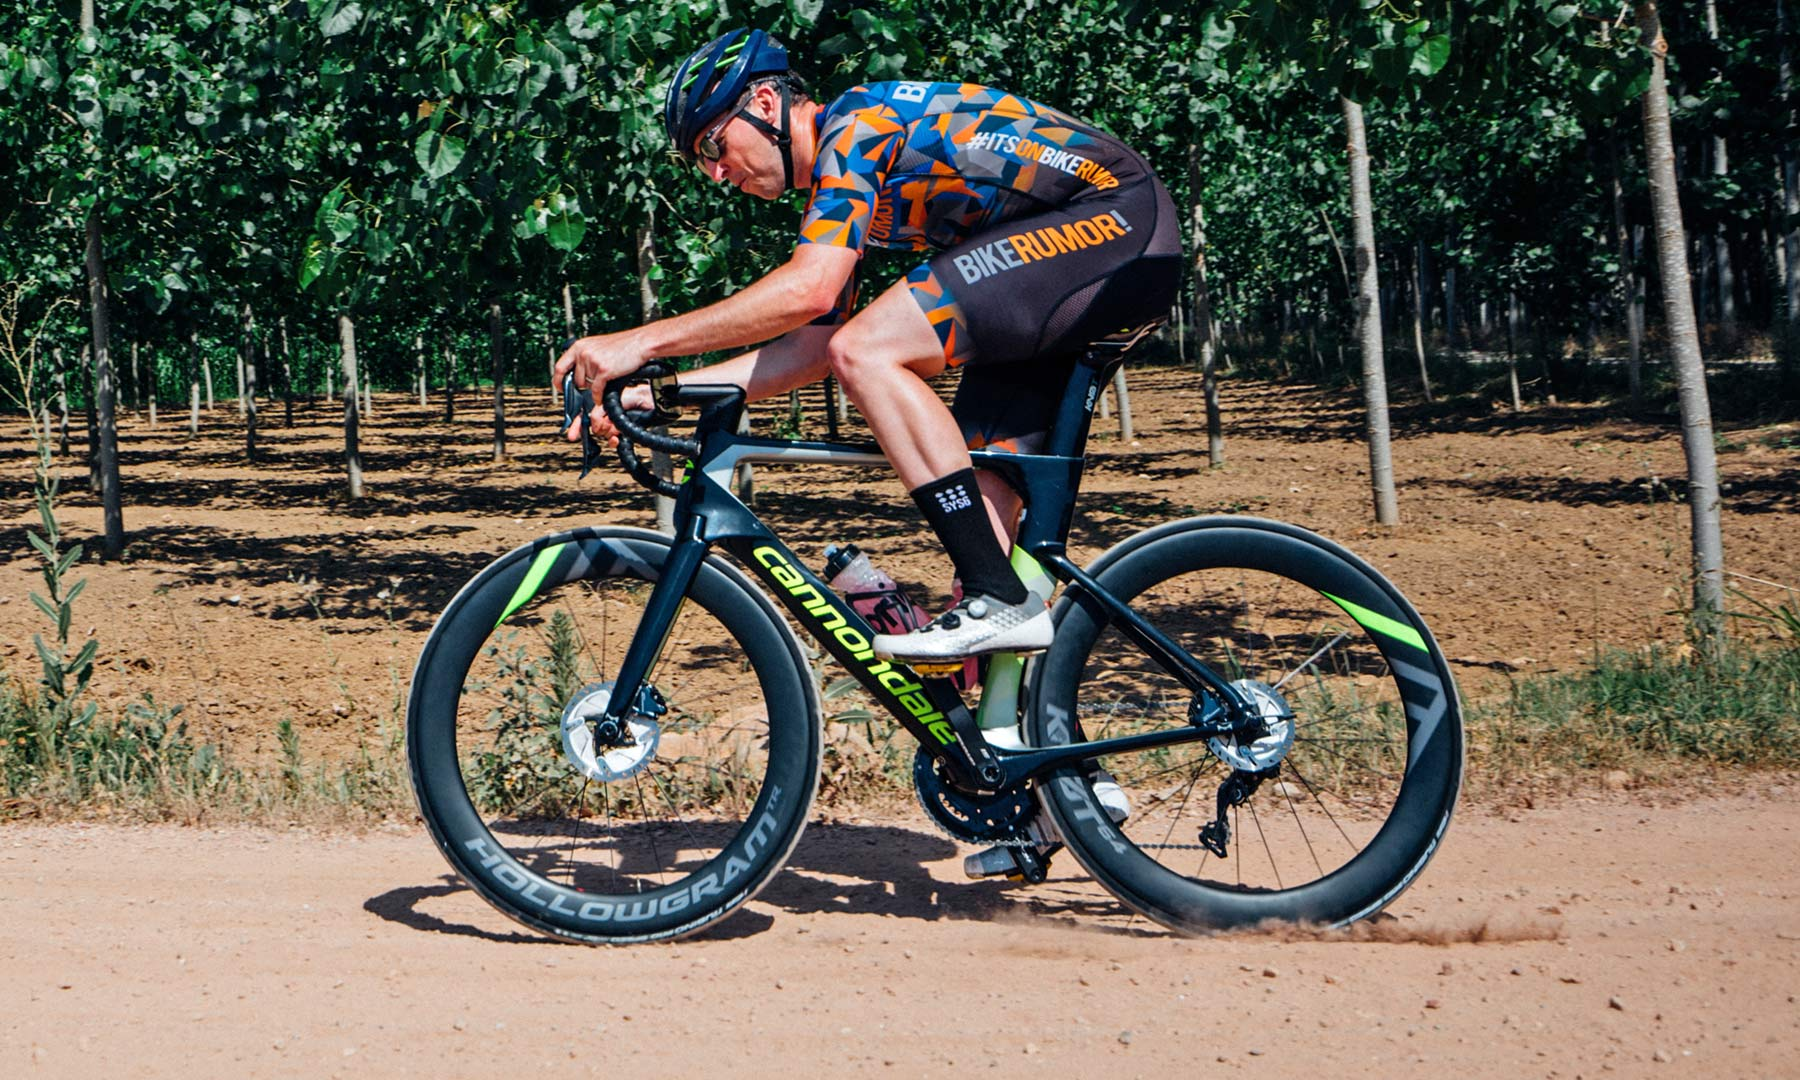 Bikerumor Editor s Choice Awards 2018 - Cory s Best Bikes   Gear ... 7f5c6bd9d